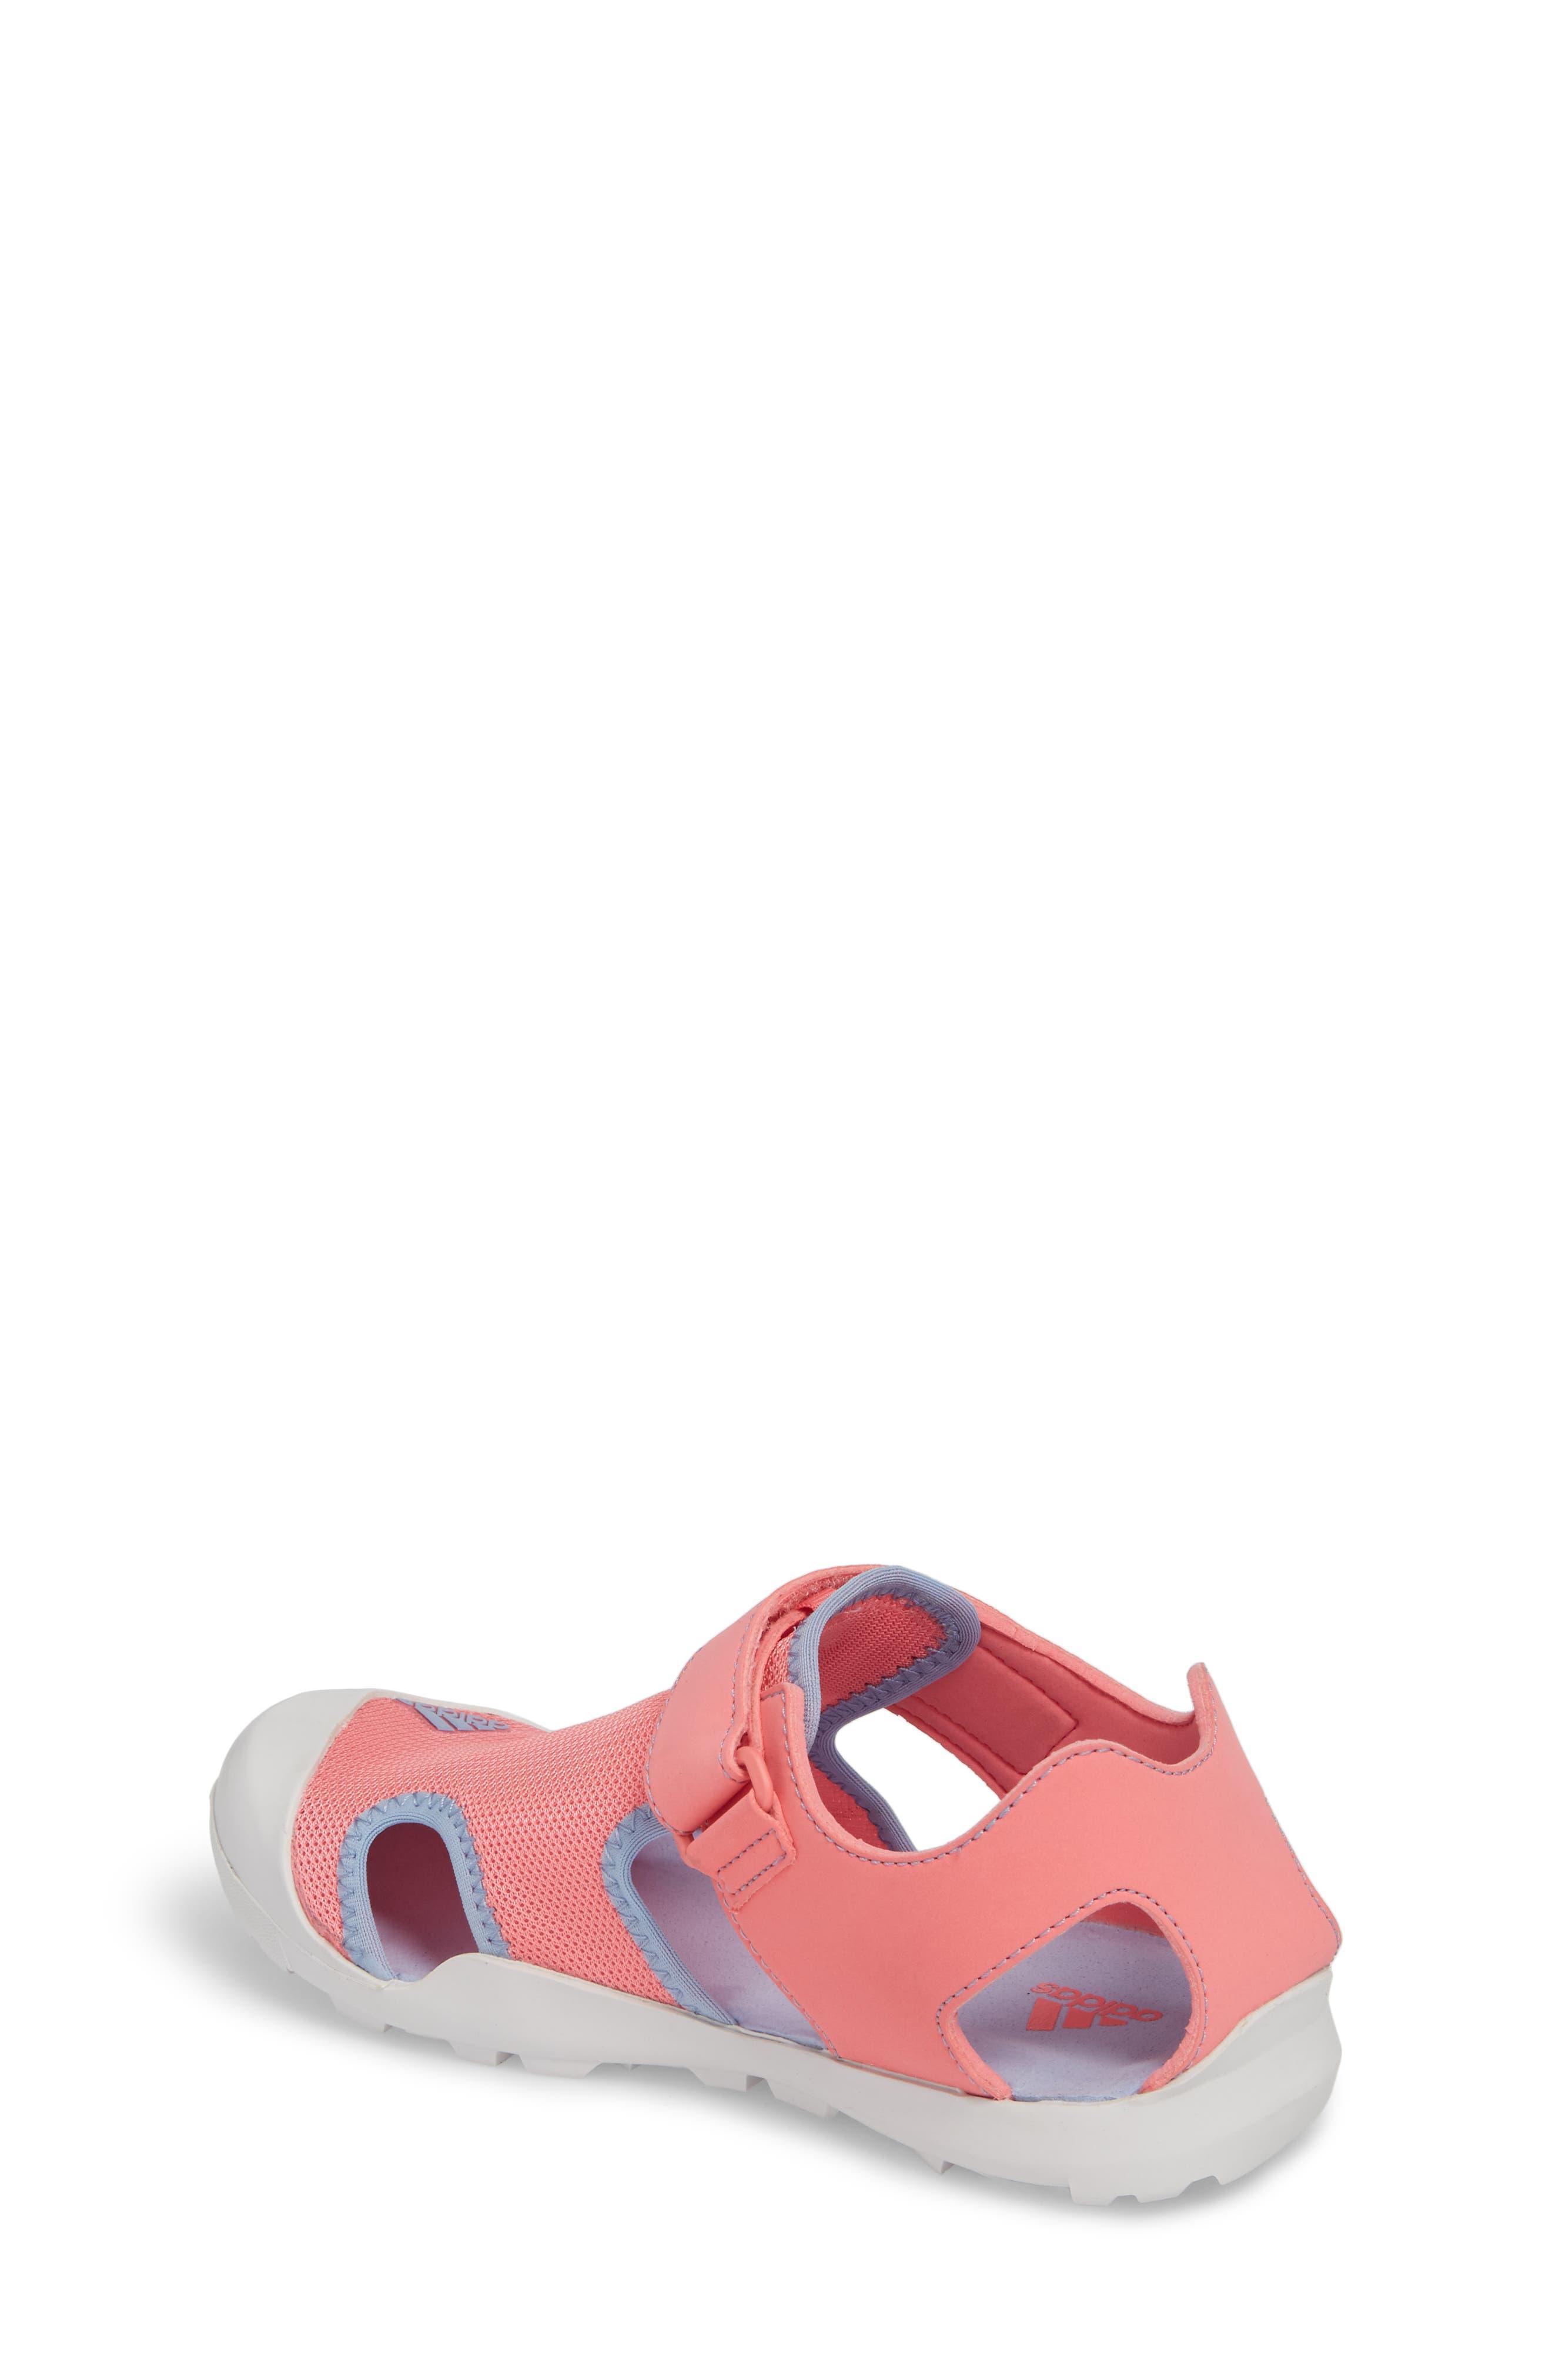 'Captain Toey' Sandal,                             Alternate thumbnail 2, color,                             Chalk Pink/ Chalk Blue/ Grey